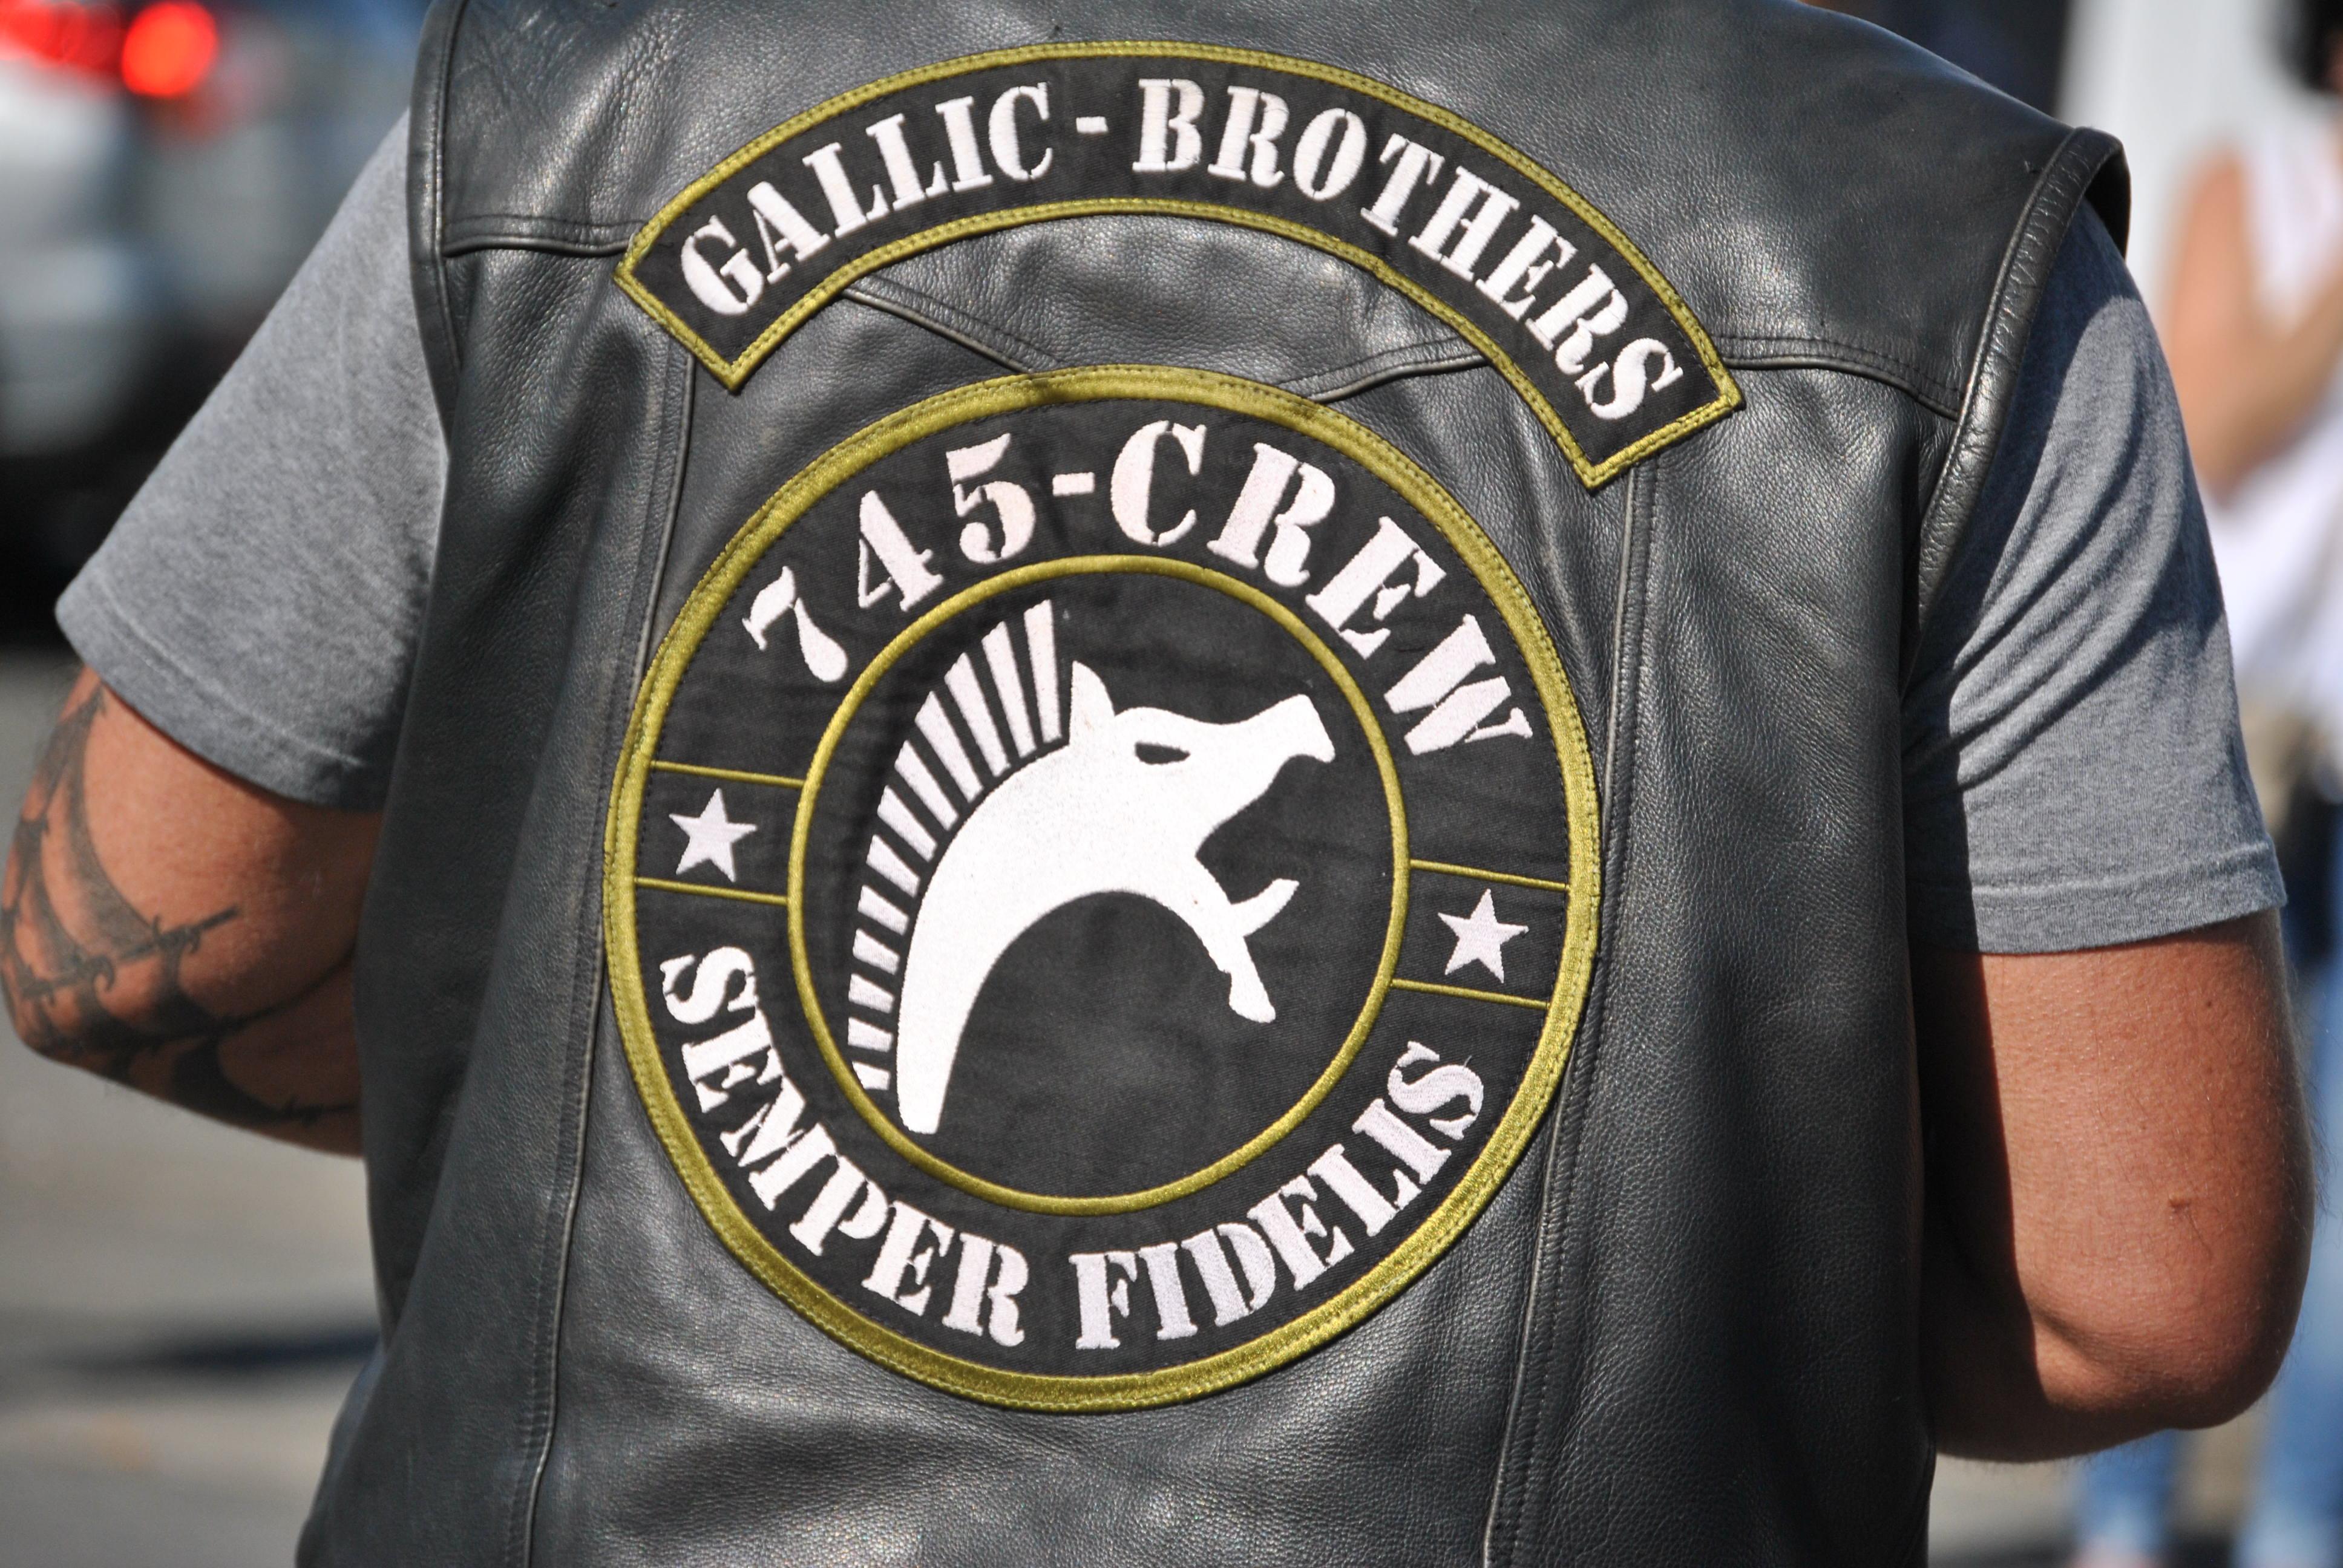 GALLIC BROTHERS